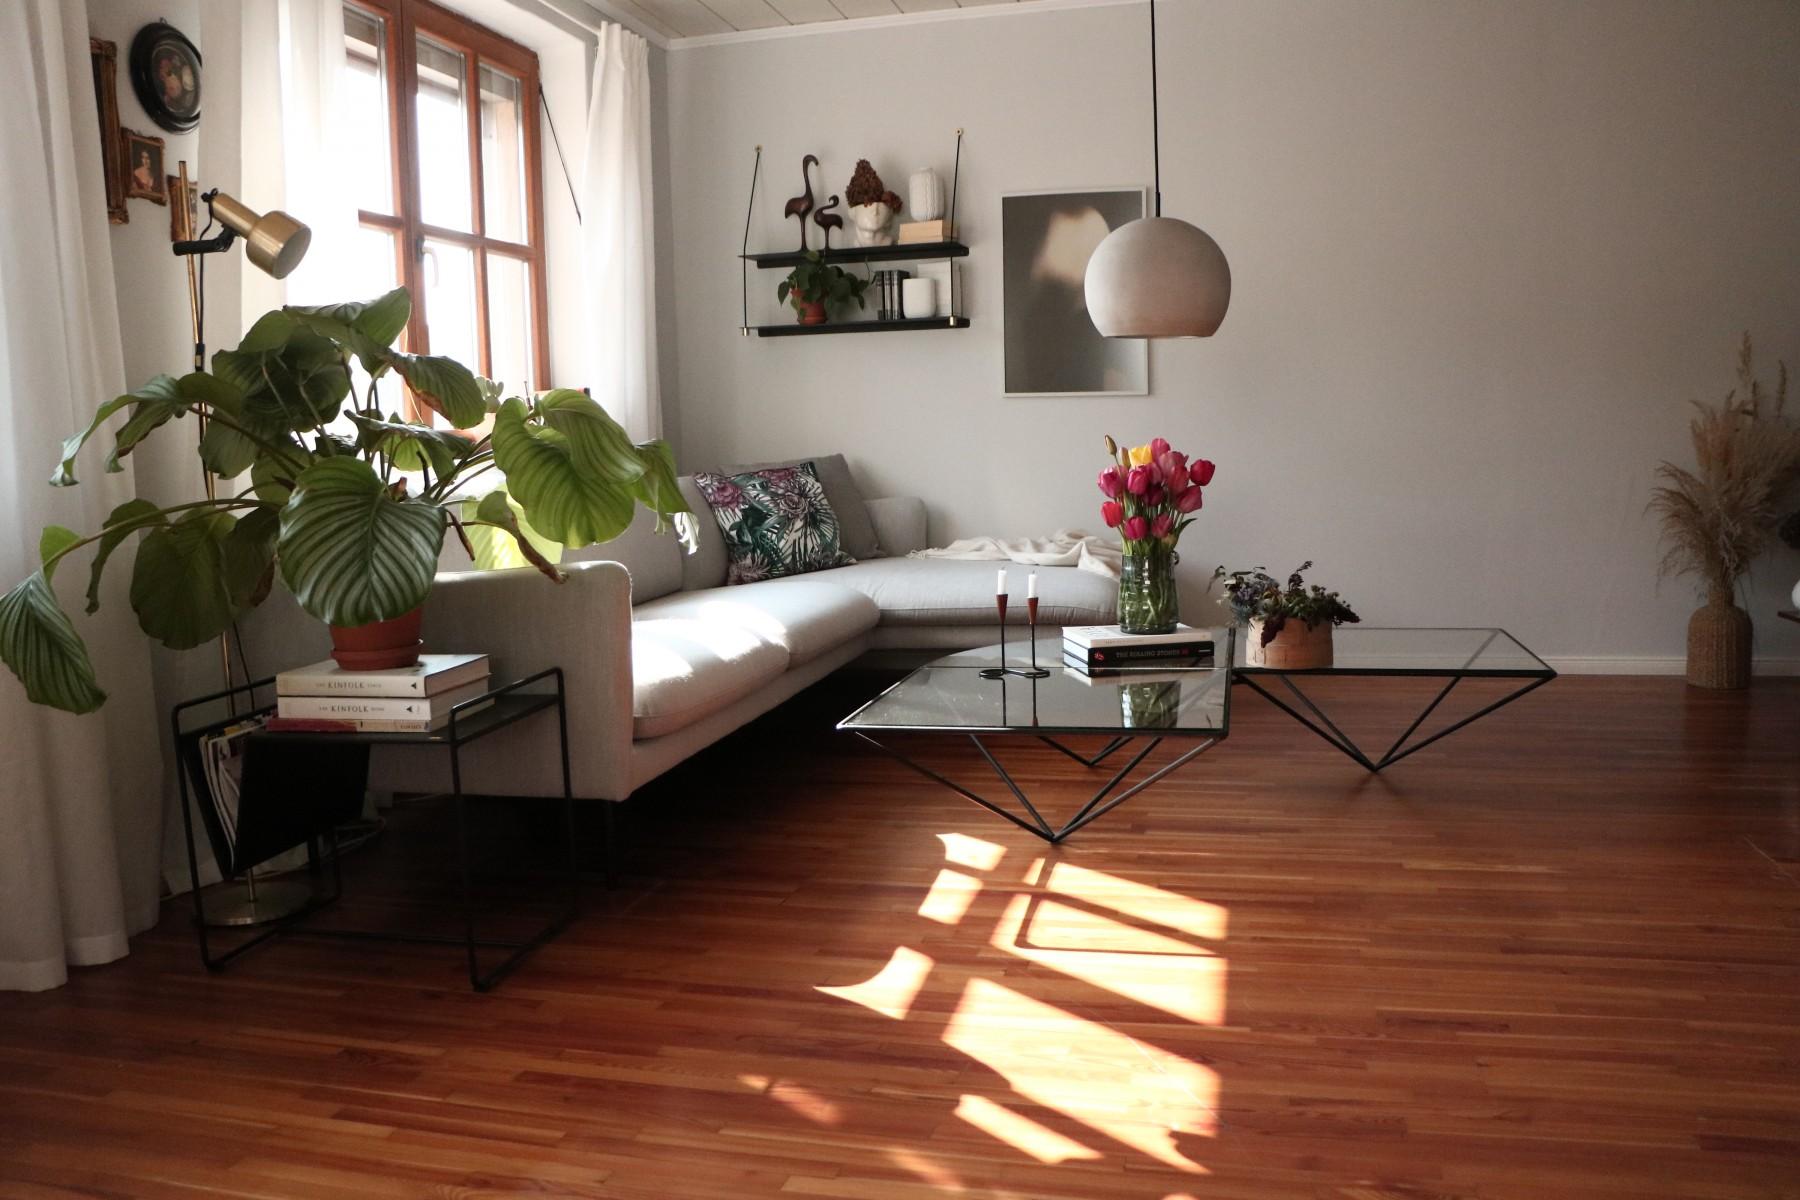 Fenster, Vorhang, Modern, Pflanze, Sofa, Weiß, Naturholz